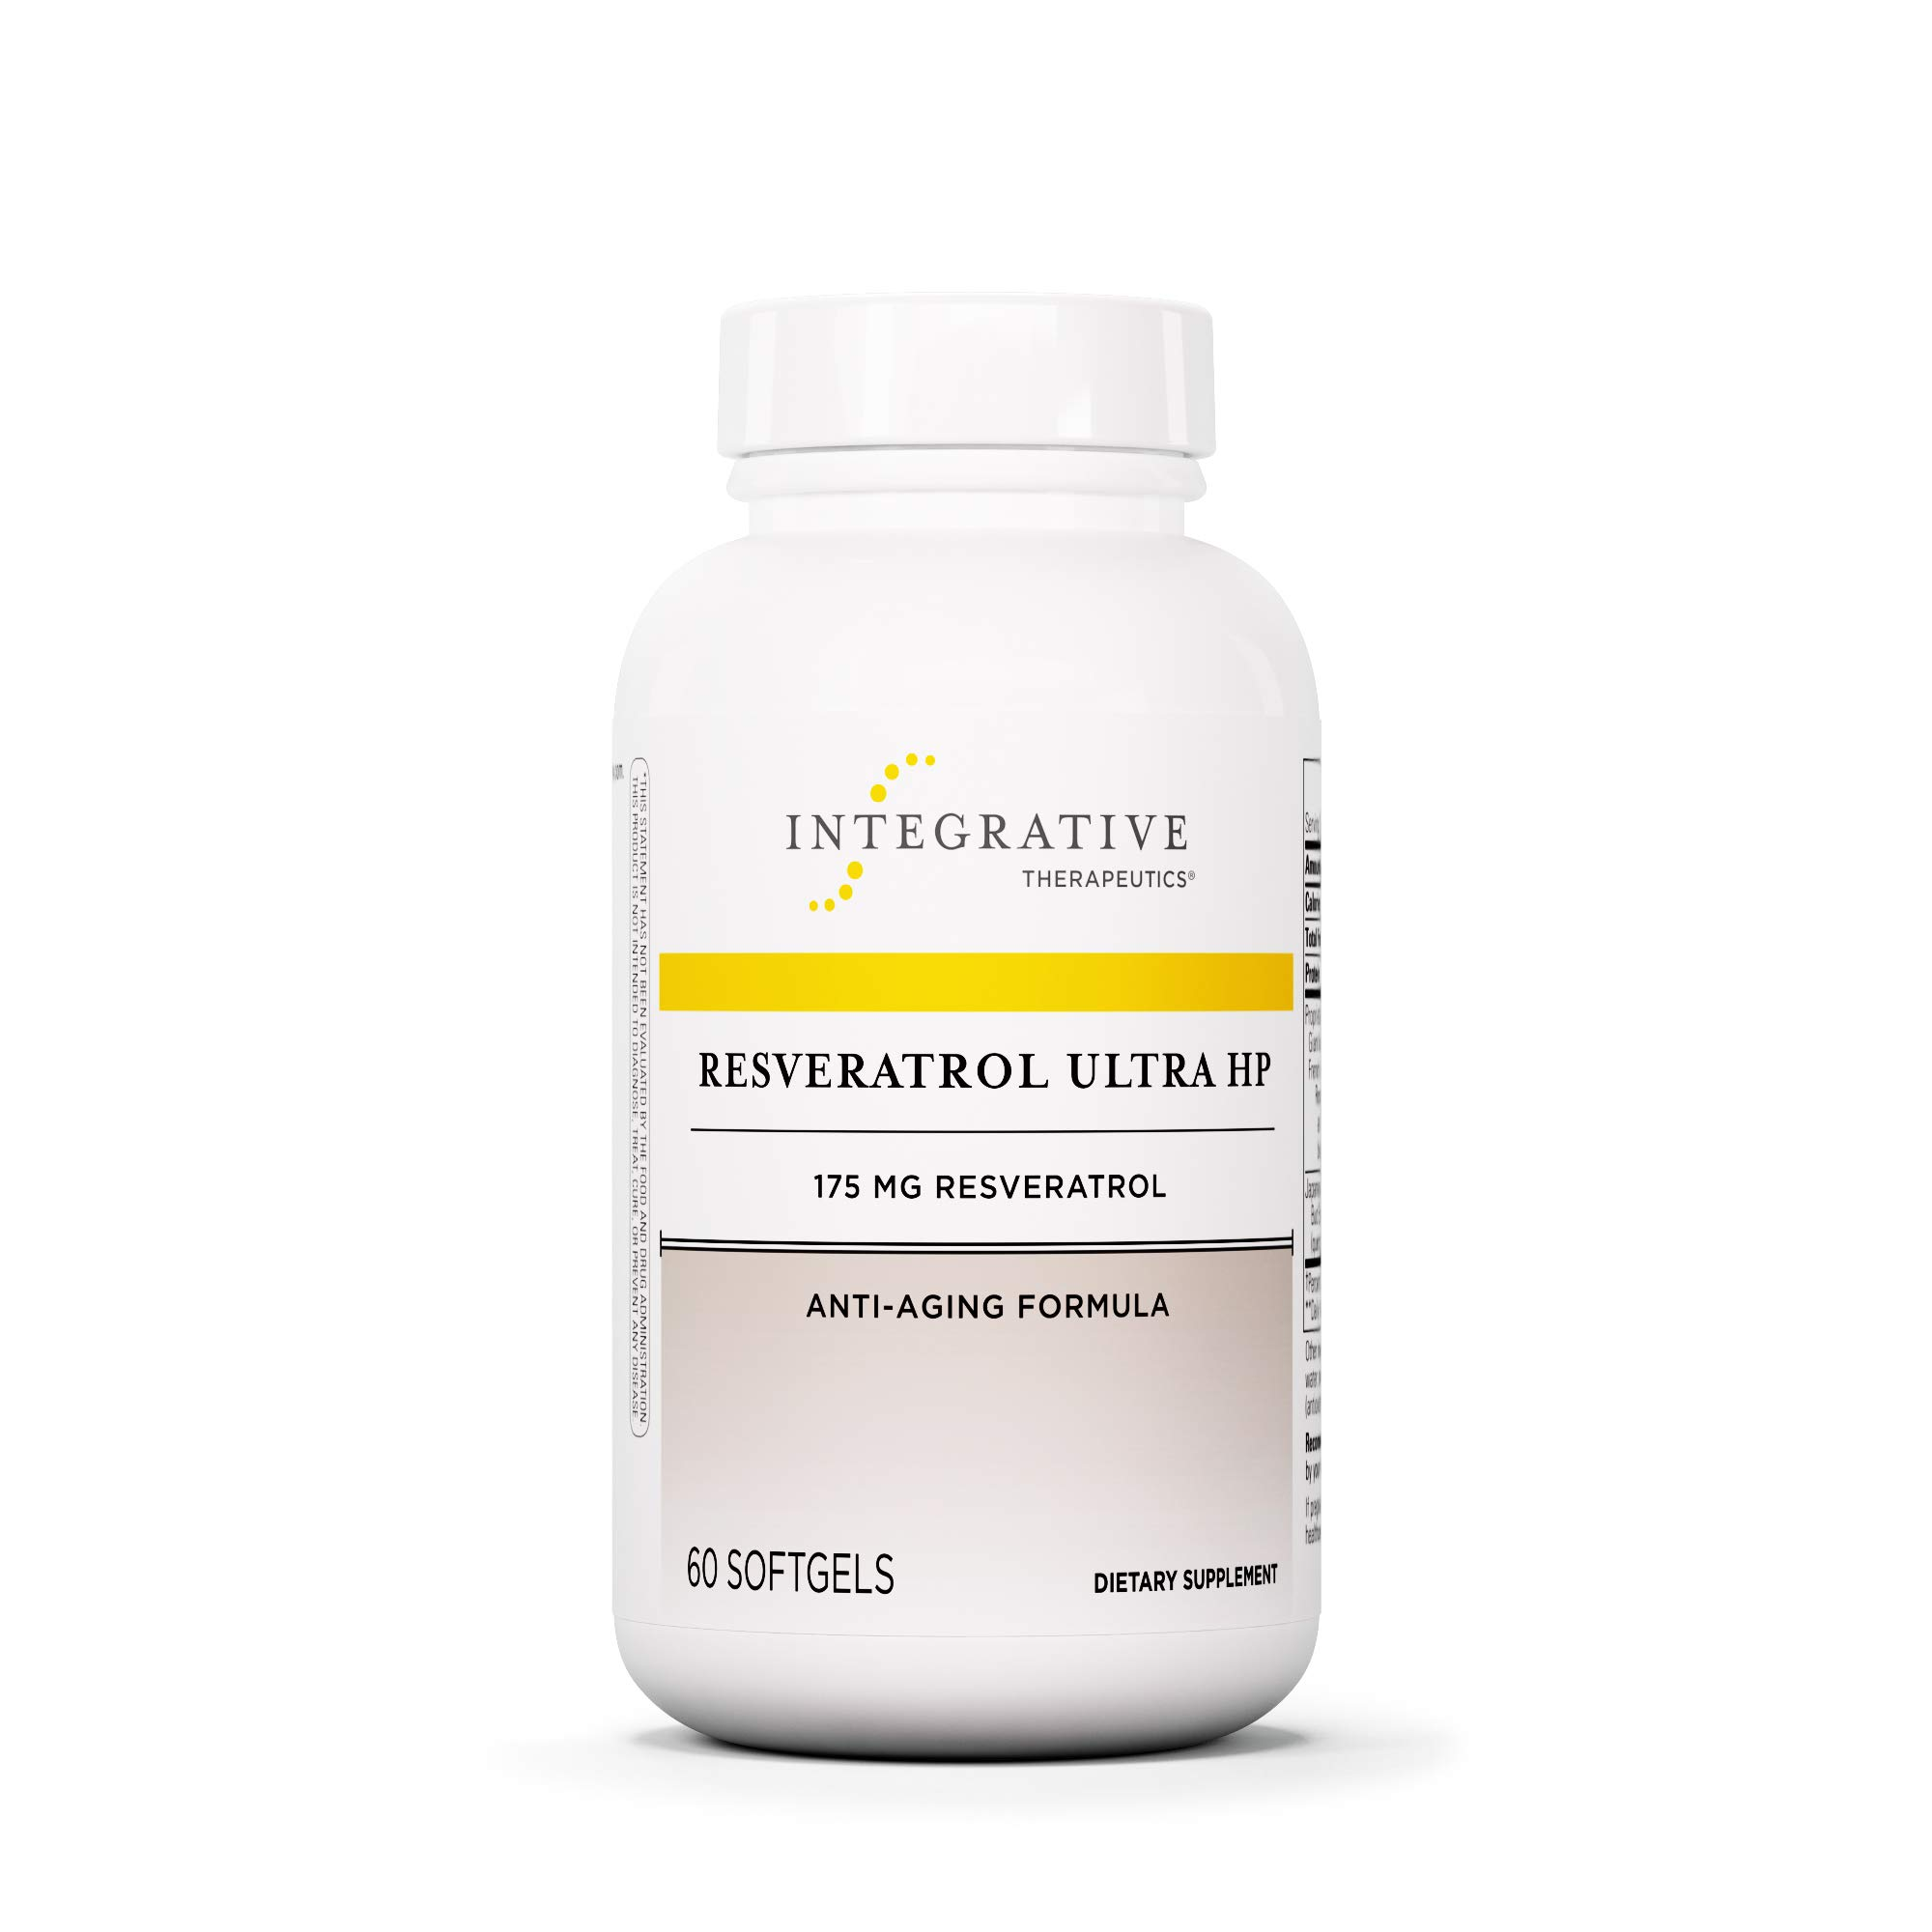 Integrative Therapeutics - Resveratrol Ultra HP, 175 mg Resveratrol - Anti Aging Formula - 60 Softgels